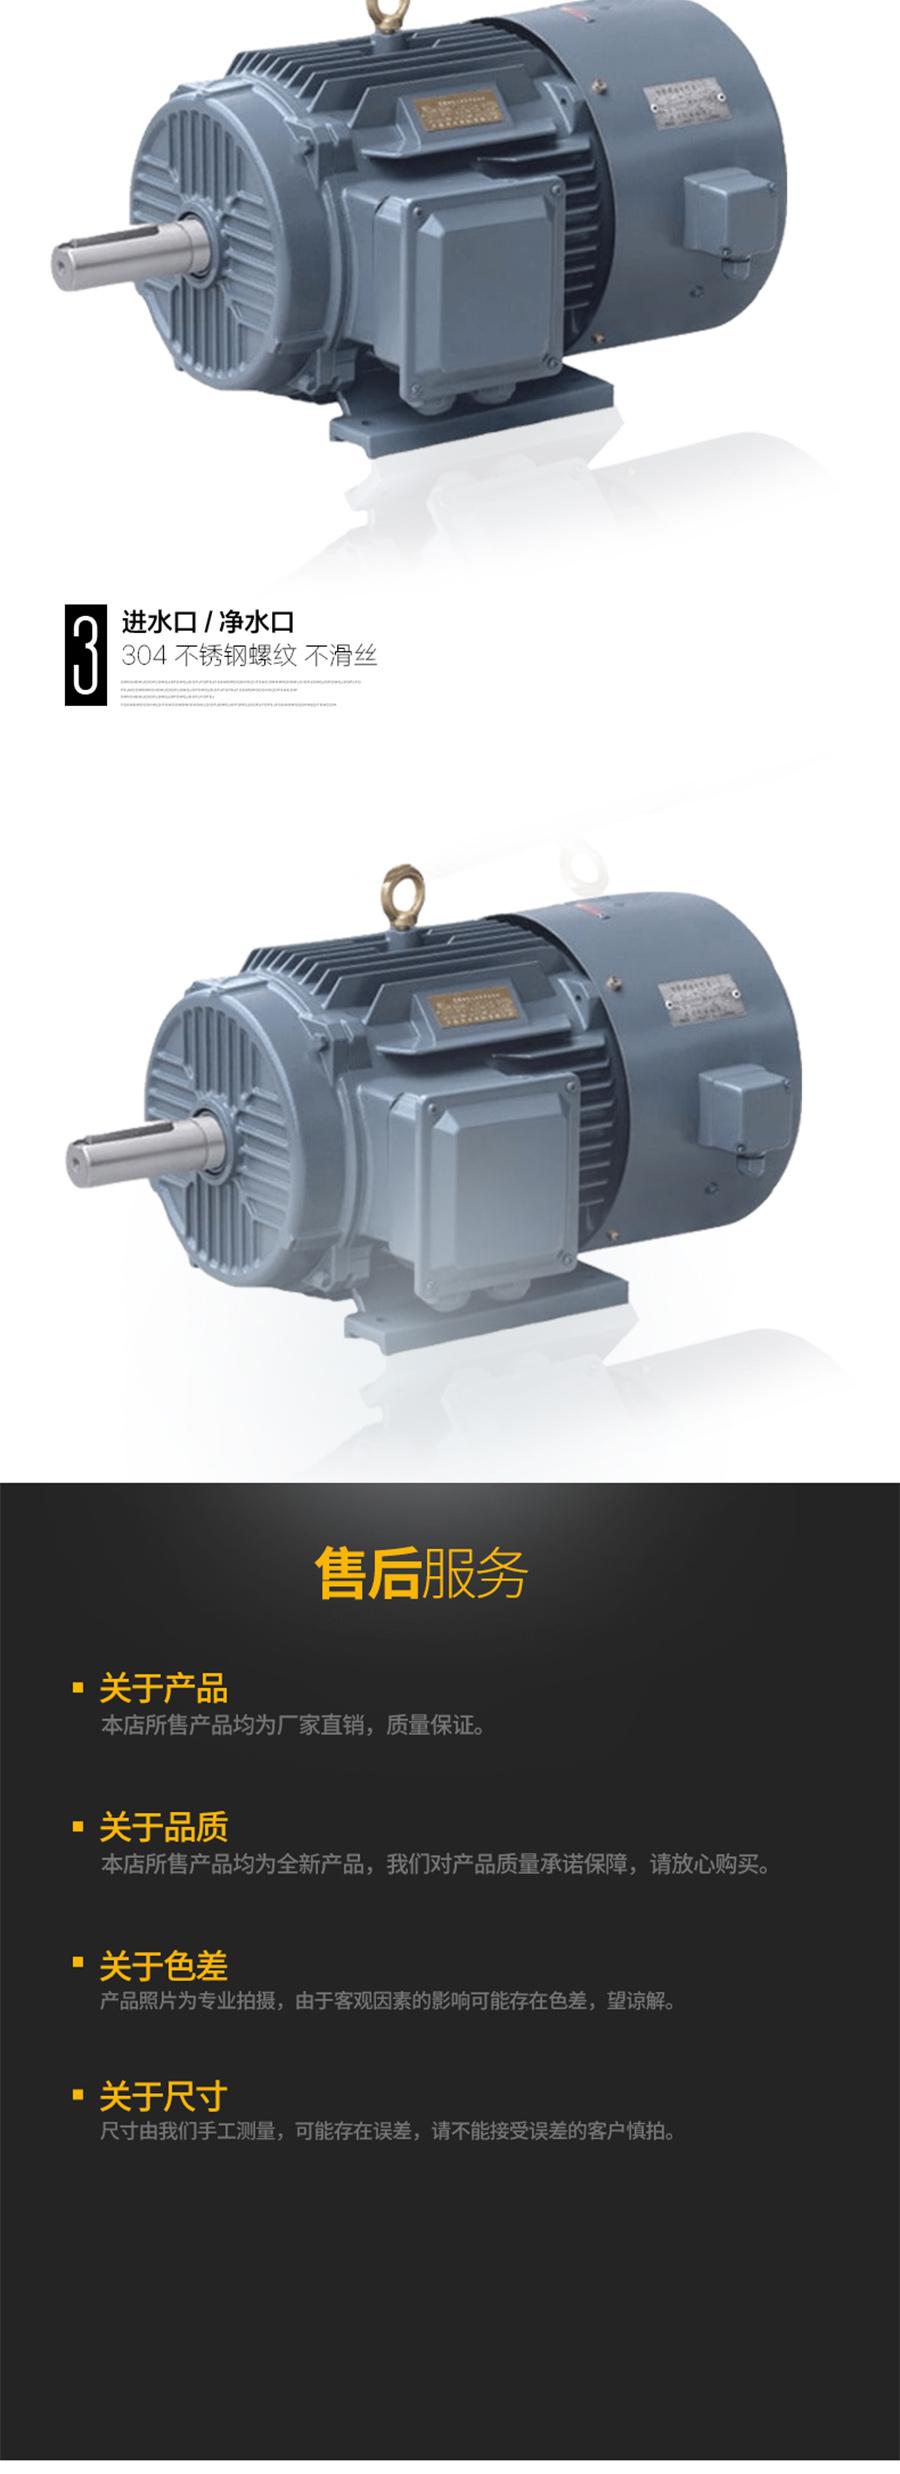 YVF 100L1-4型号电机安装和尺寸与外形尺寸图5